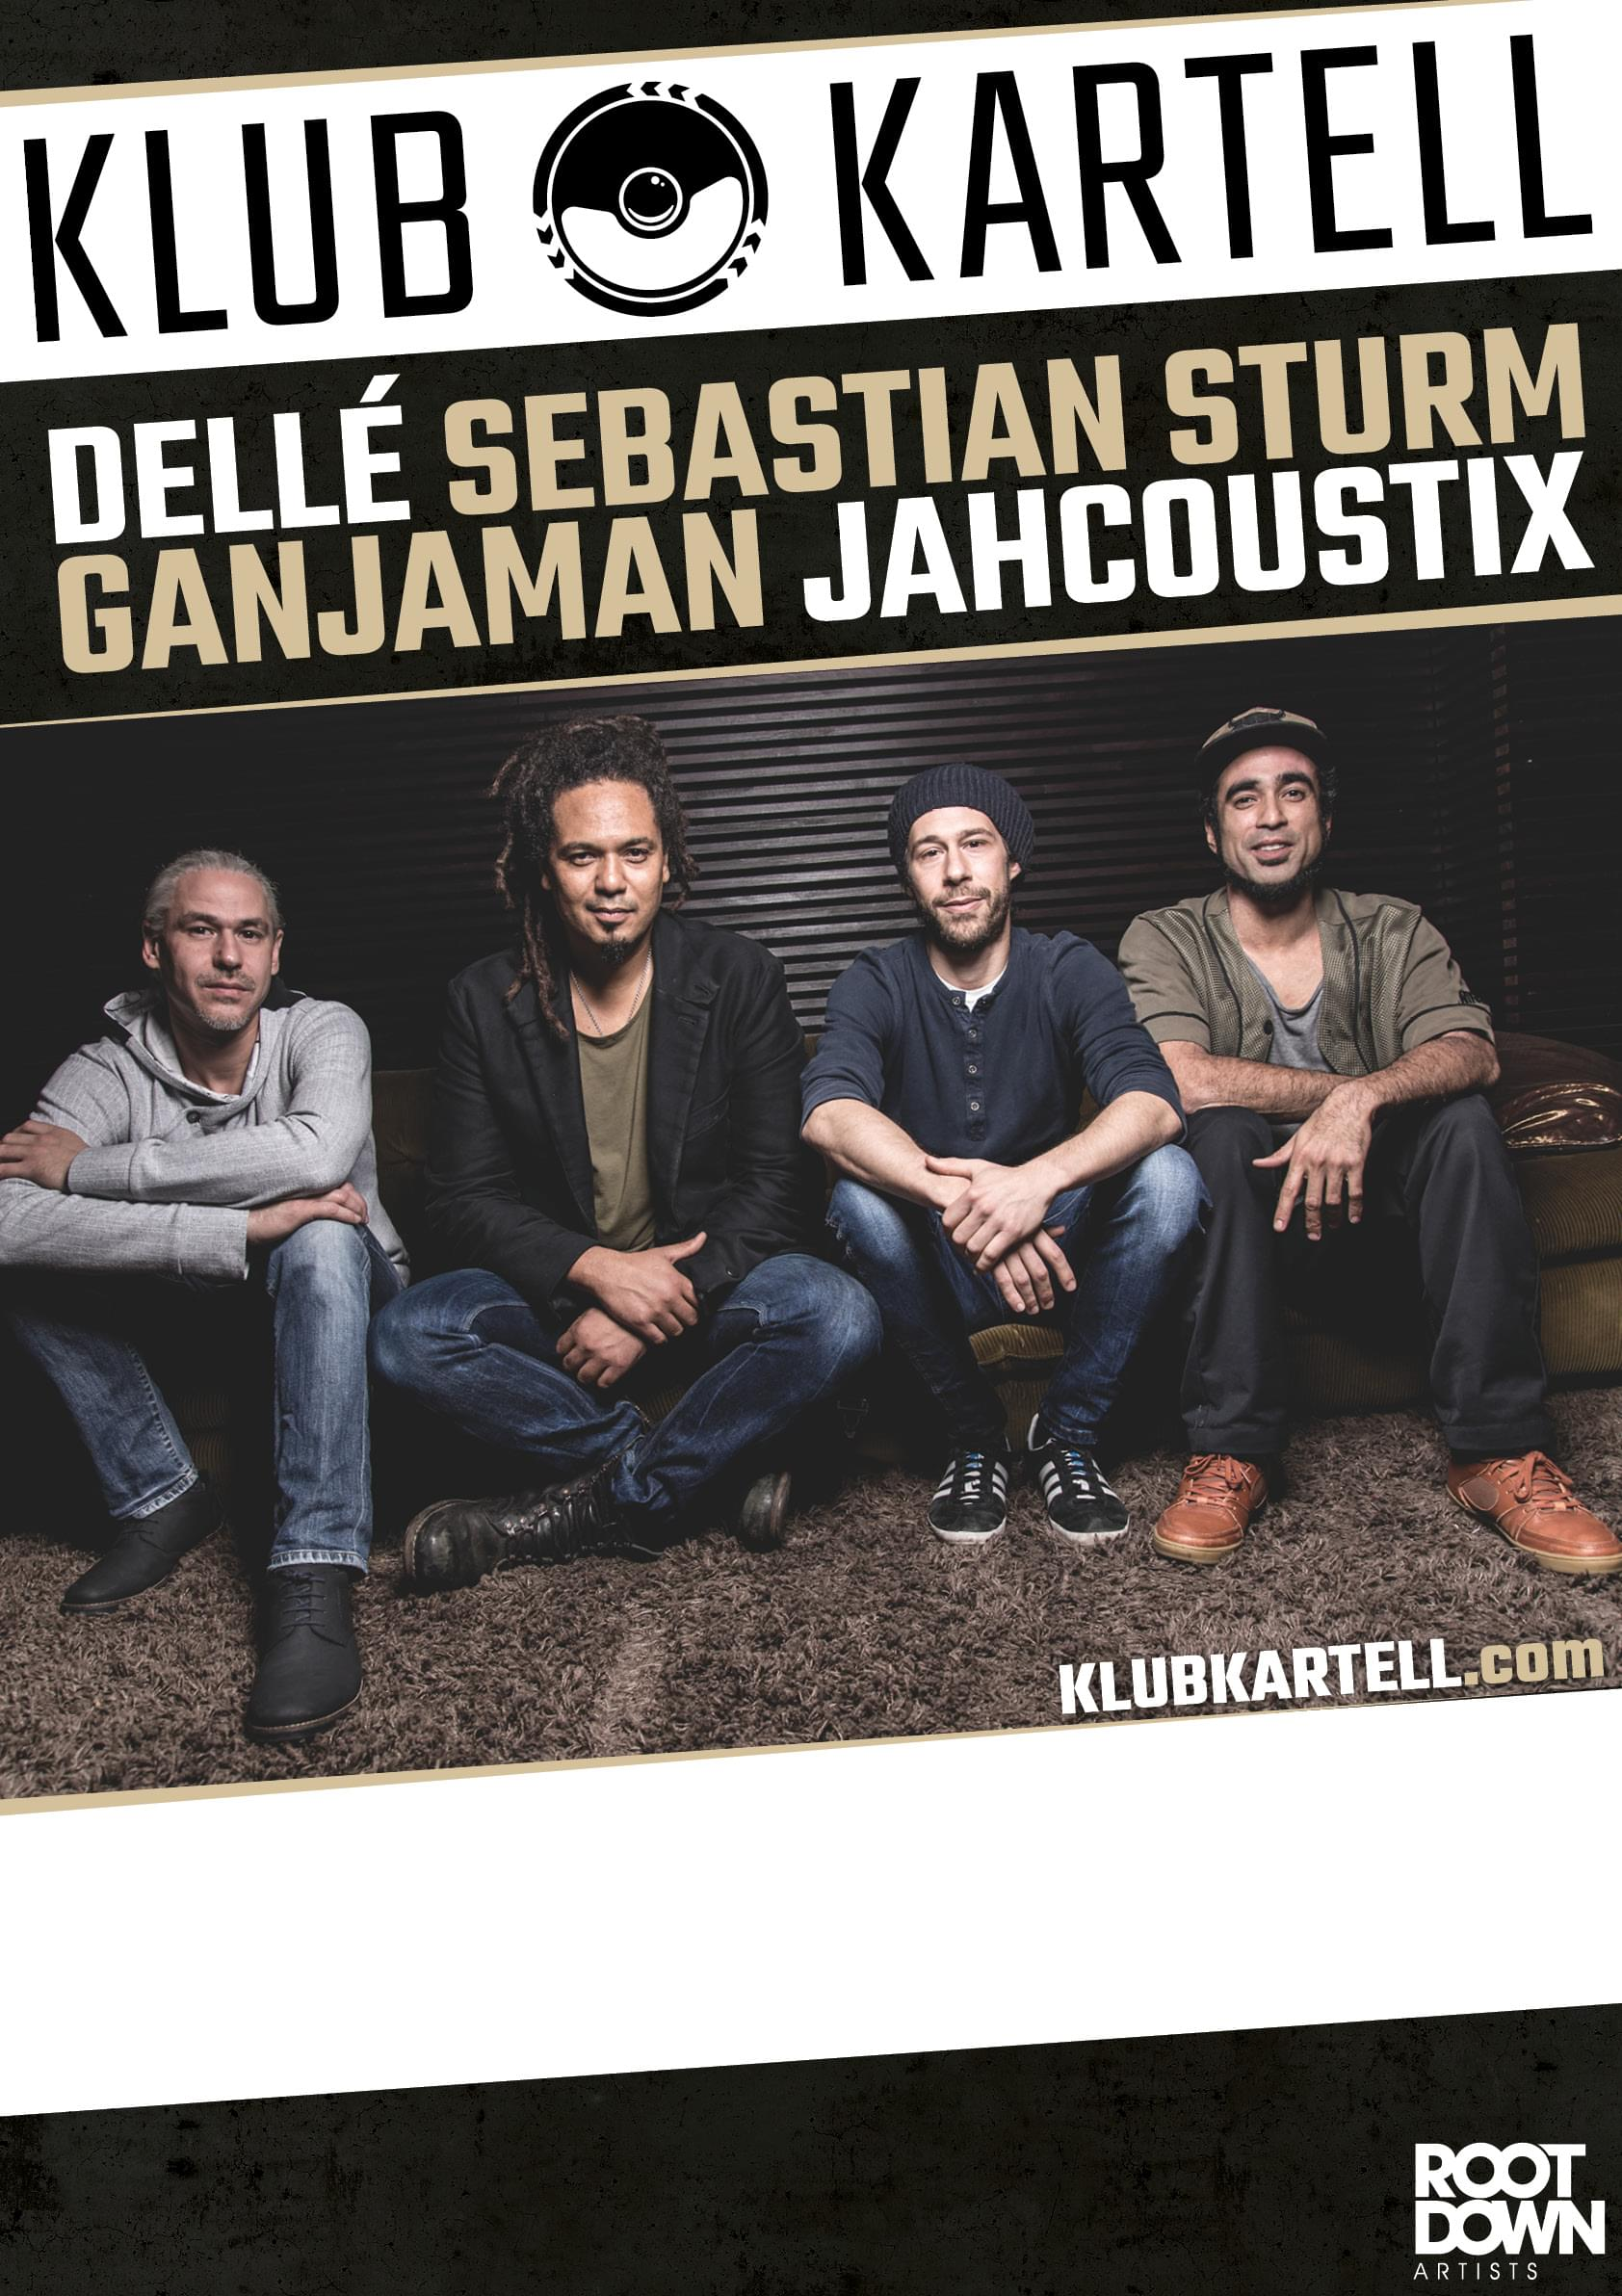 Dellé Seeed Ganjaman Jahcoustix Sebastian Sturm Klub